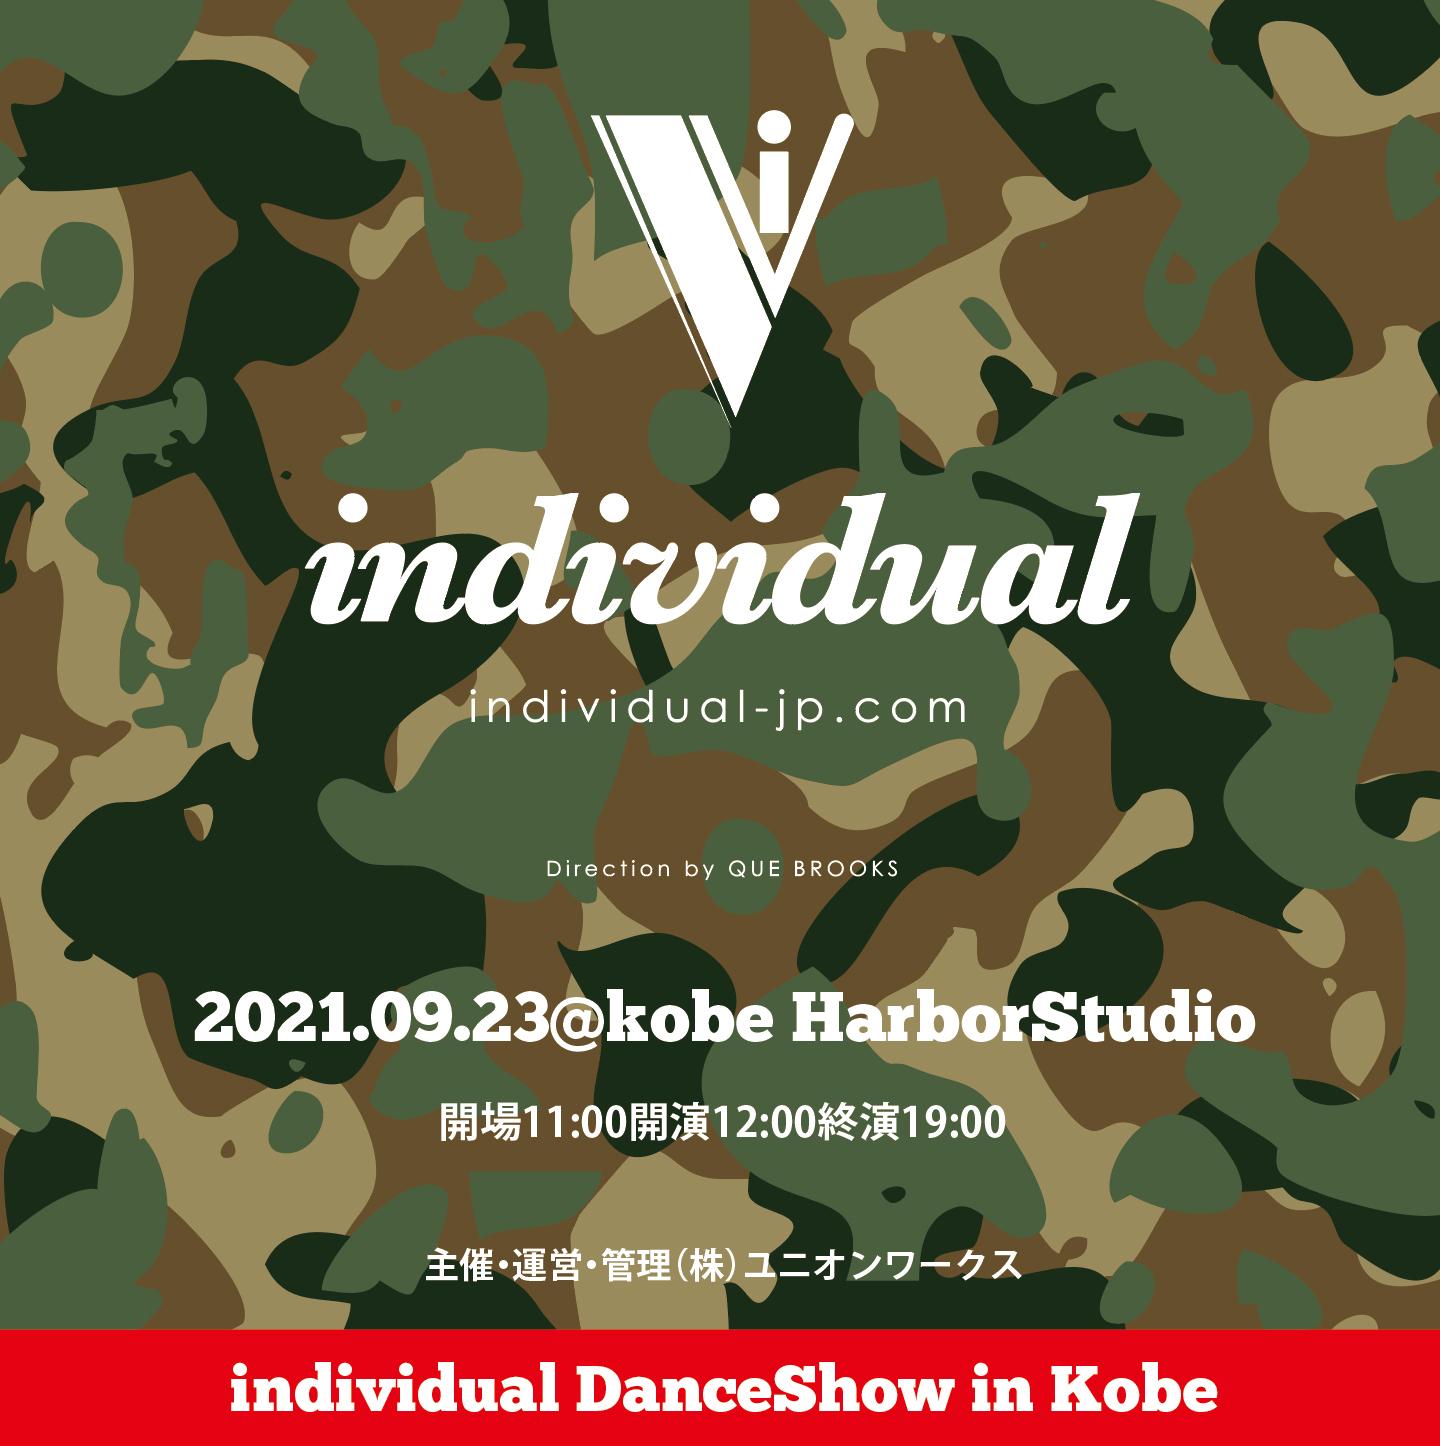 individual DanceShow in Kobe